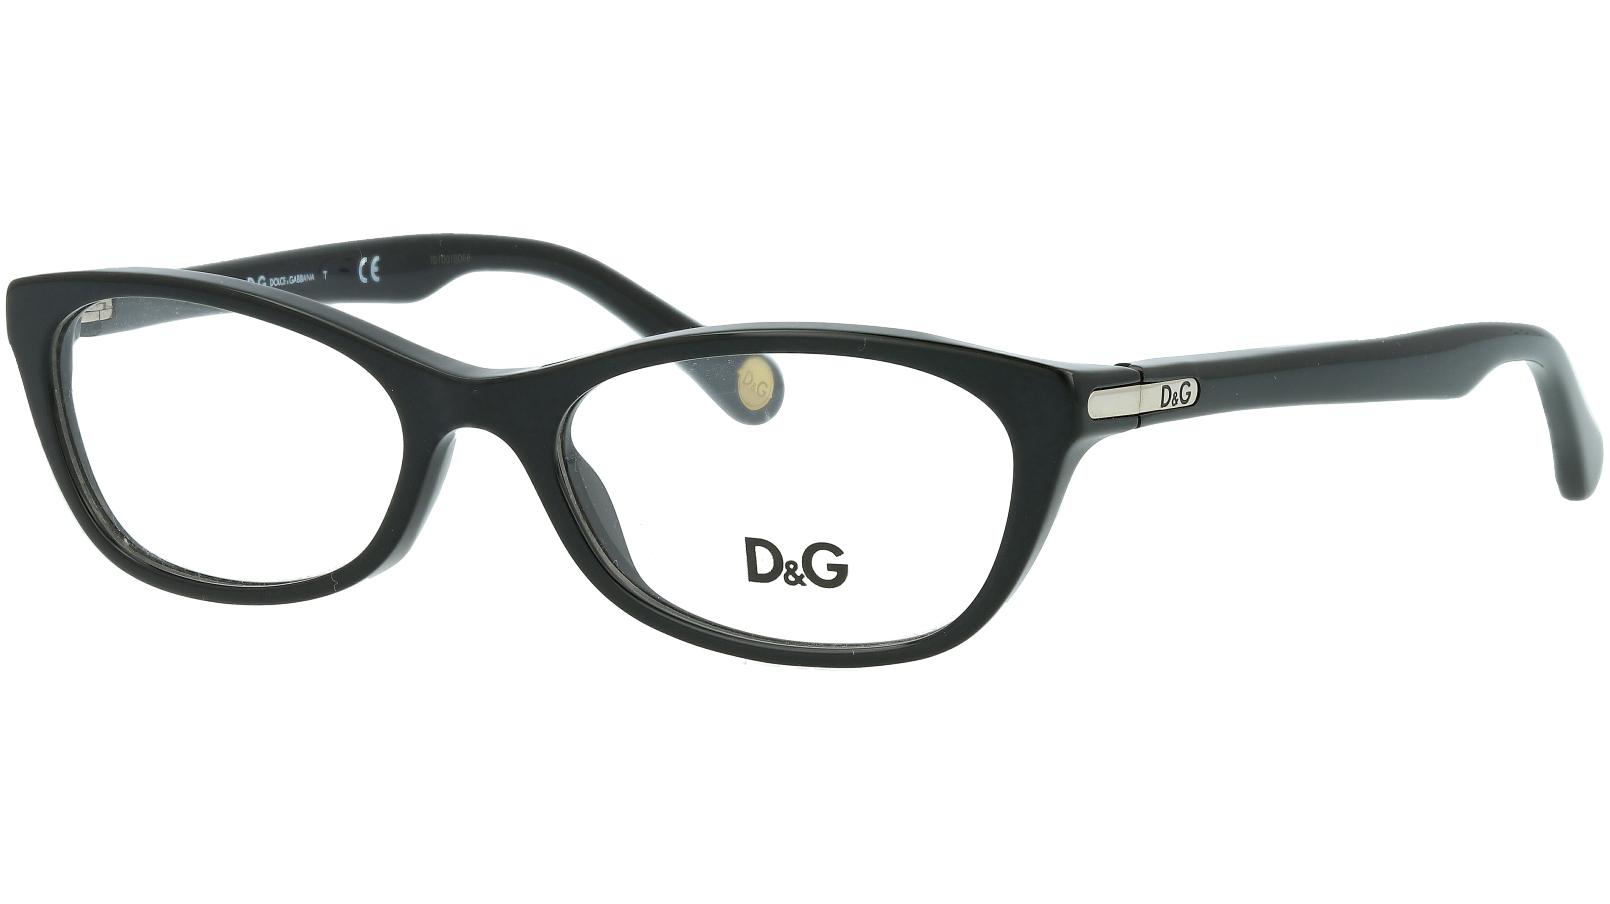 Dolce&Gabbana DG1218 501 51 BLACK Glasses